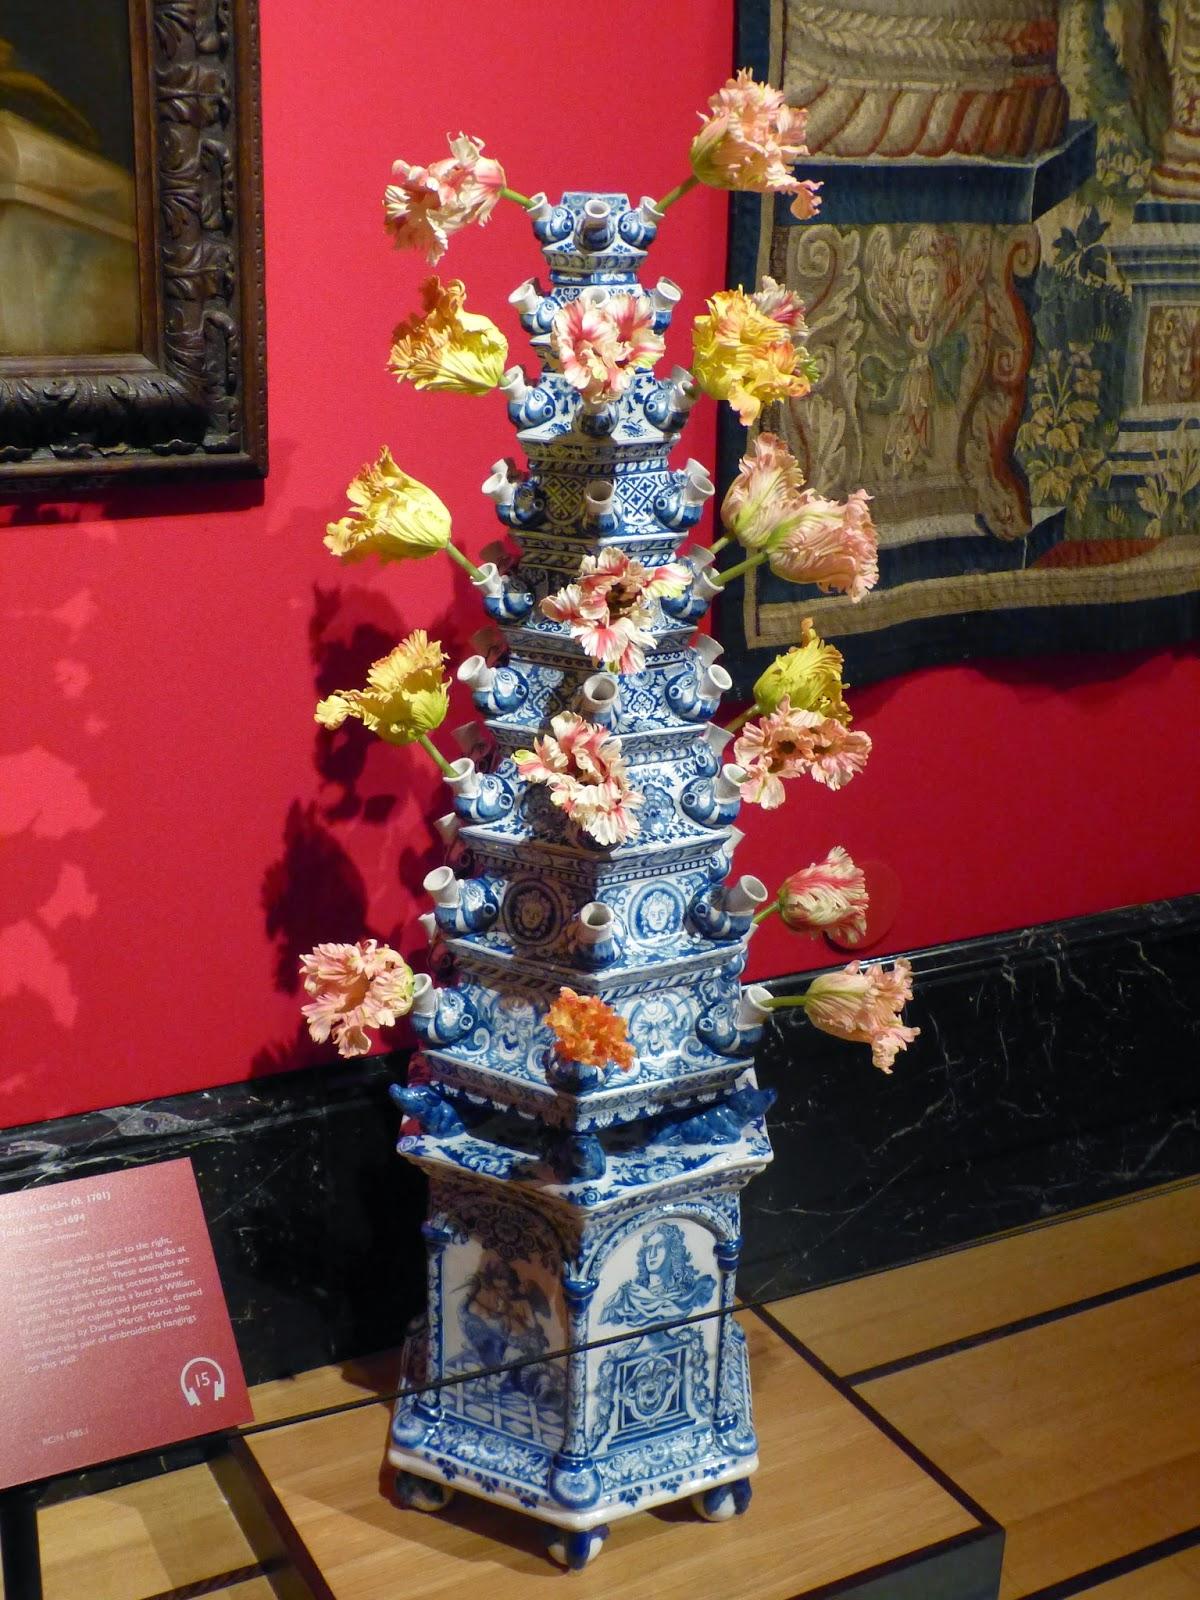 Tulip vase by Adriaen Kocks (c1694)